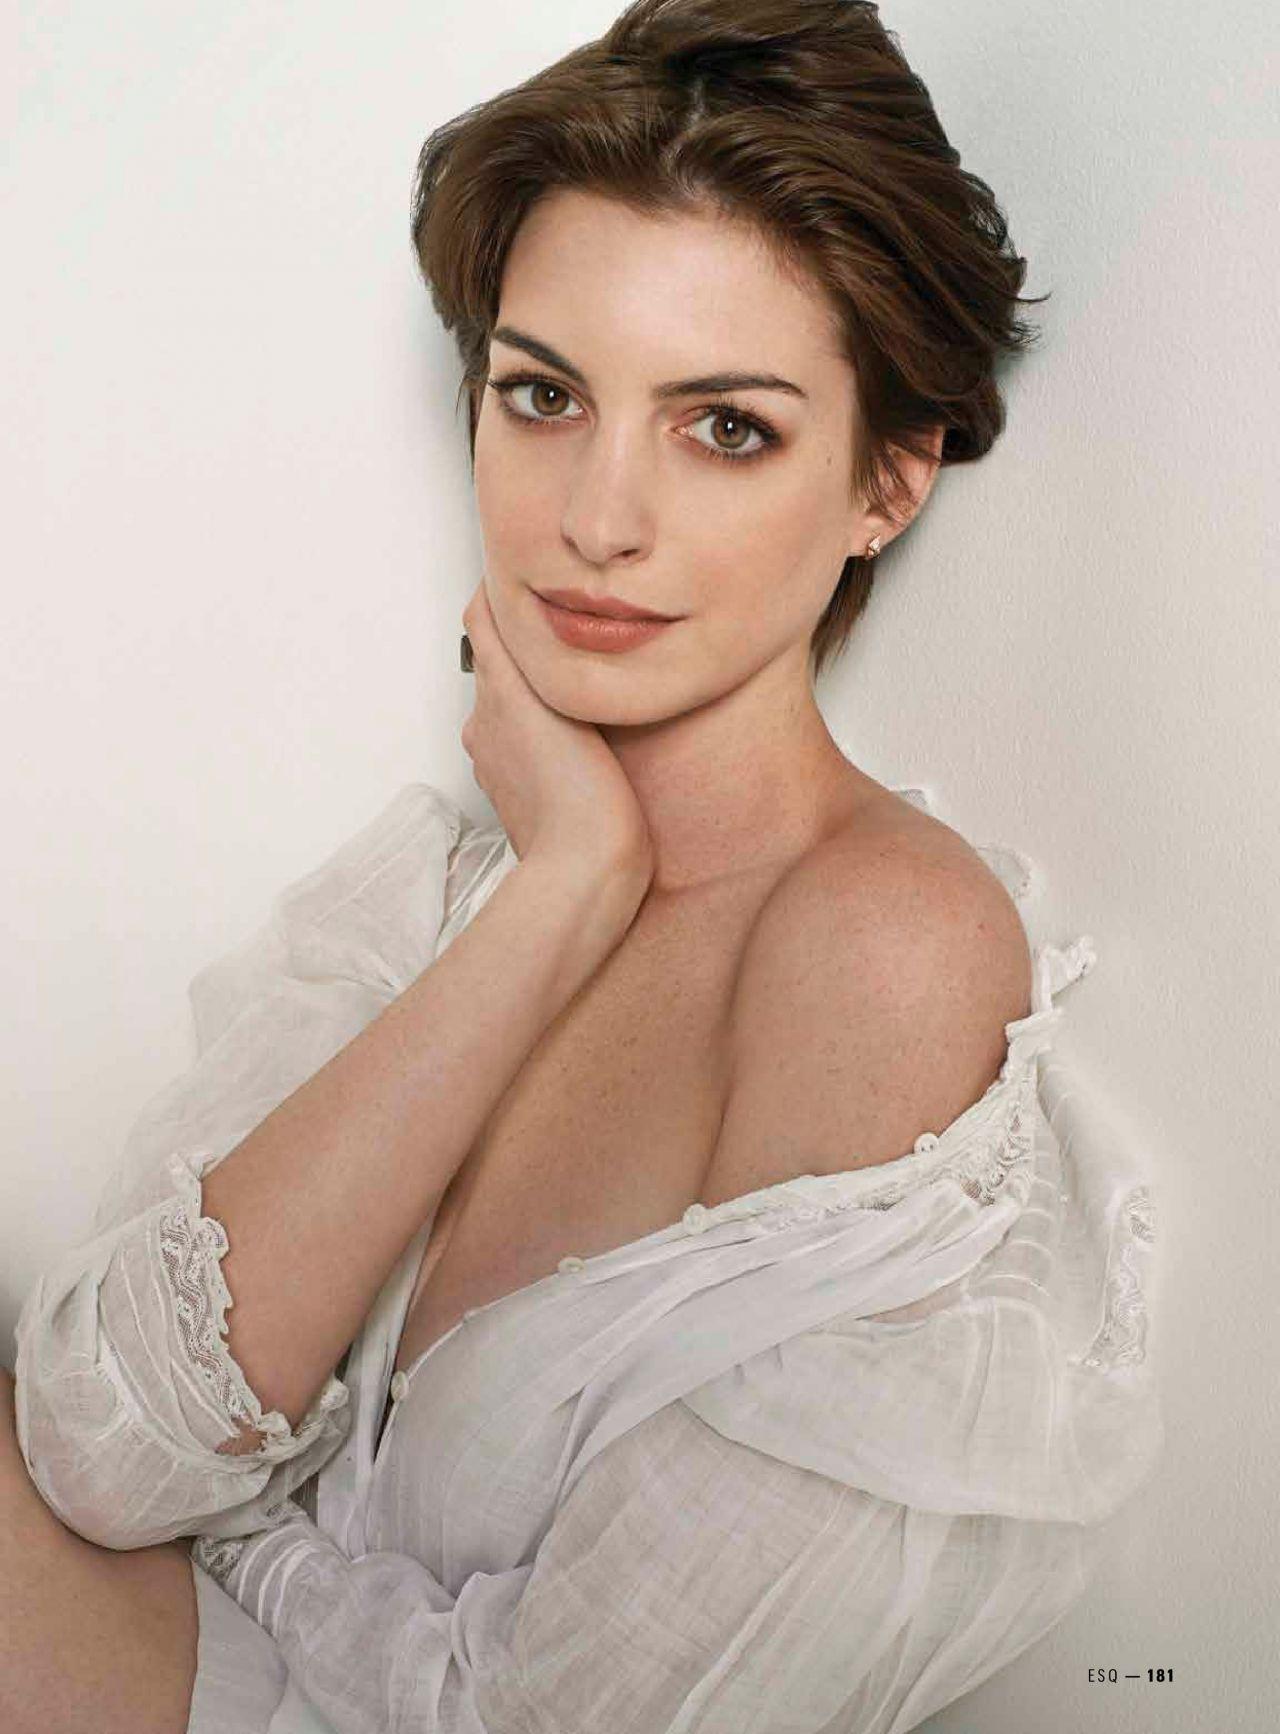 Anne Hathaway Iphone Background